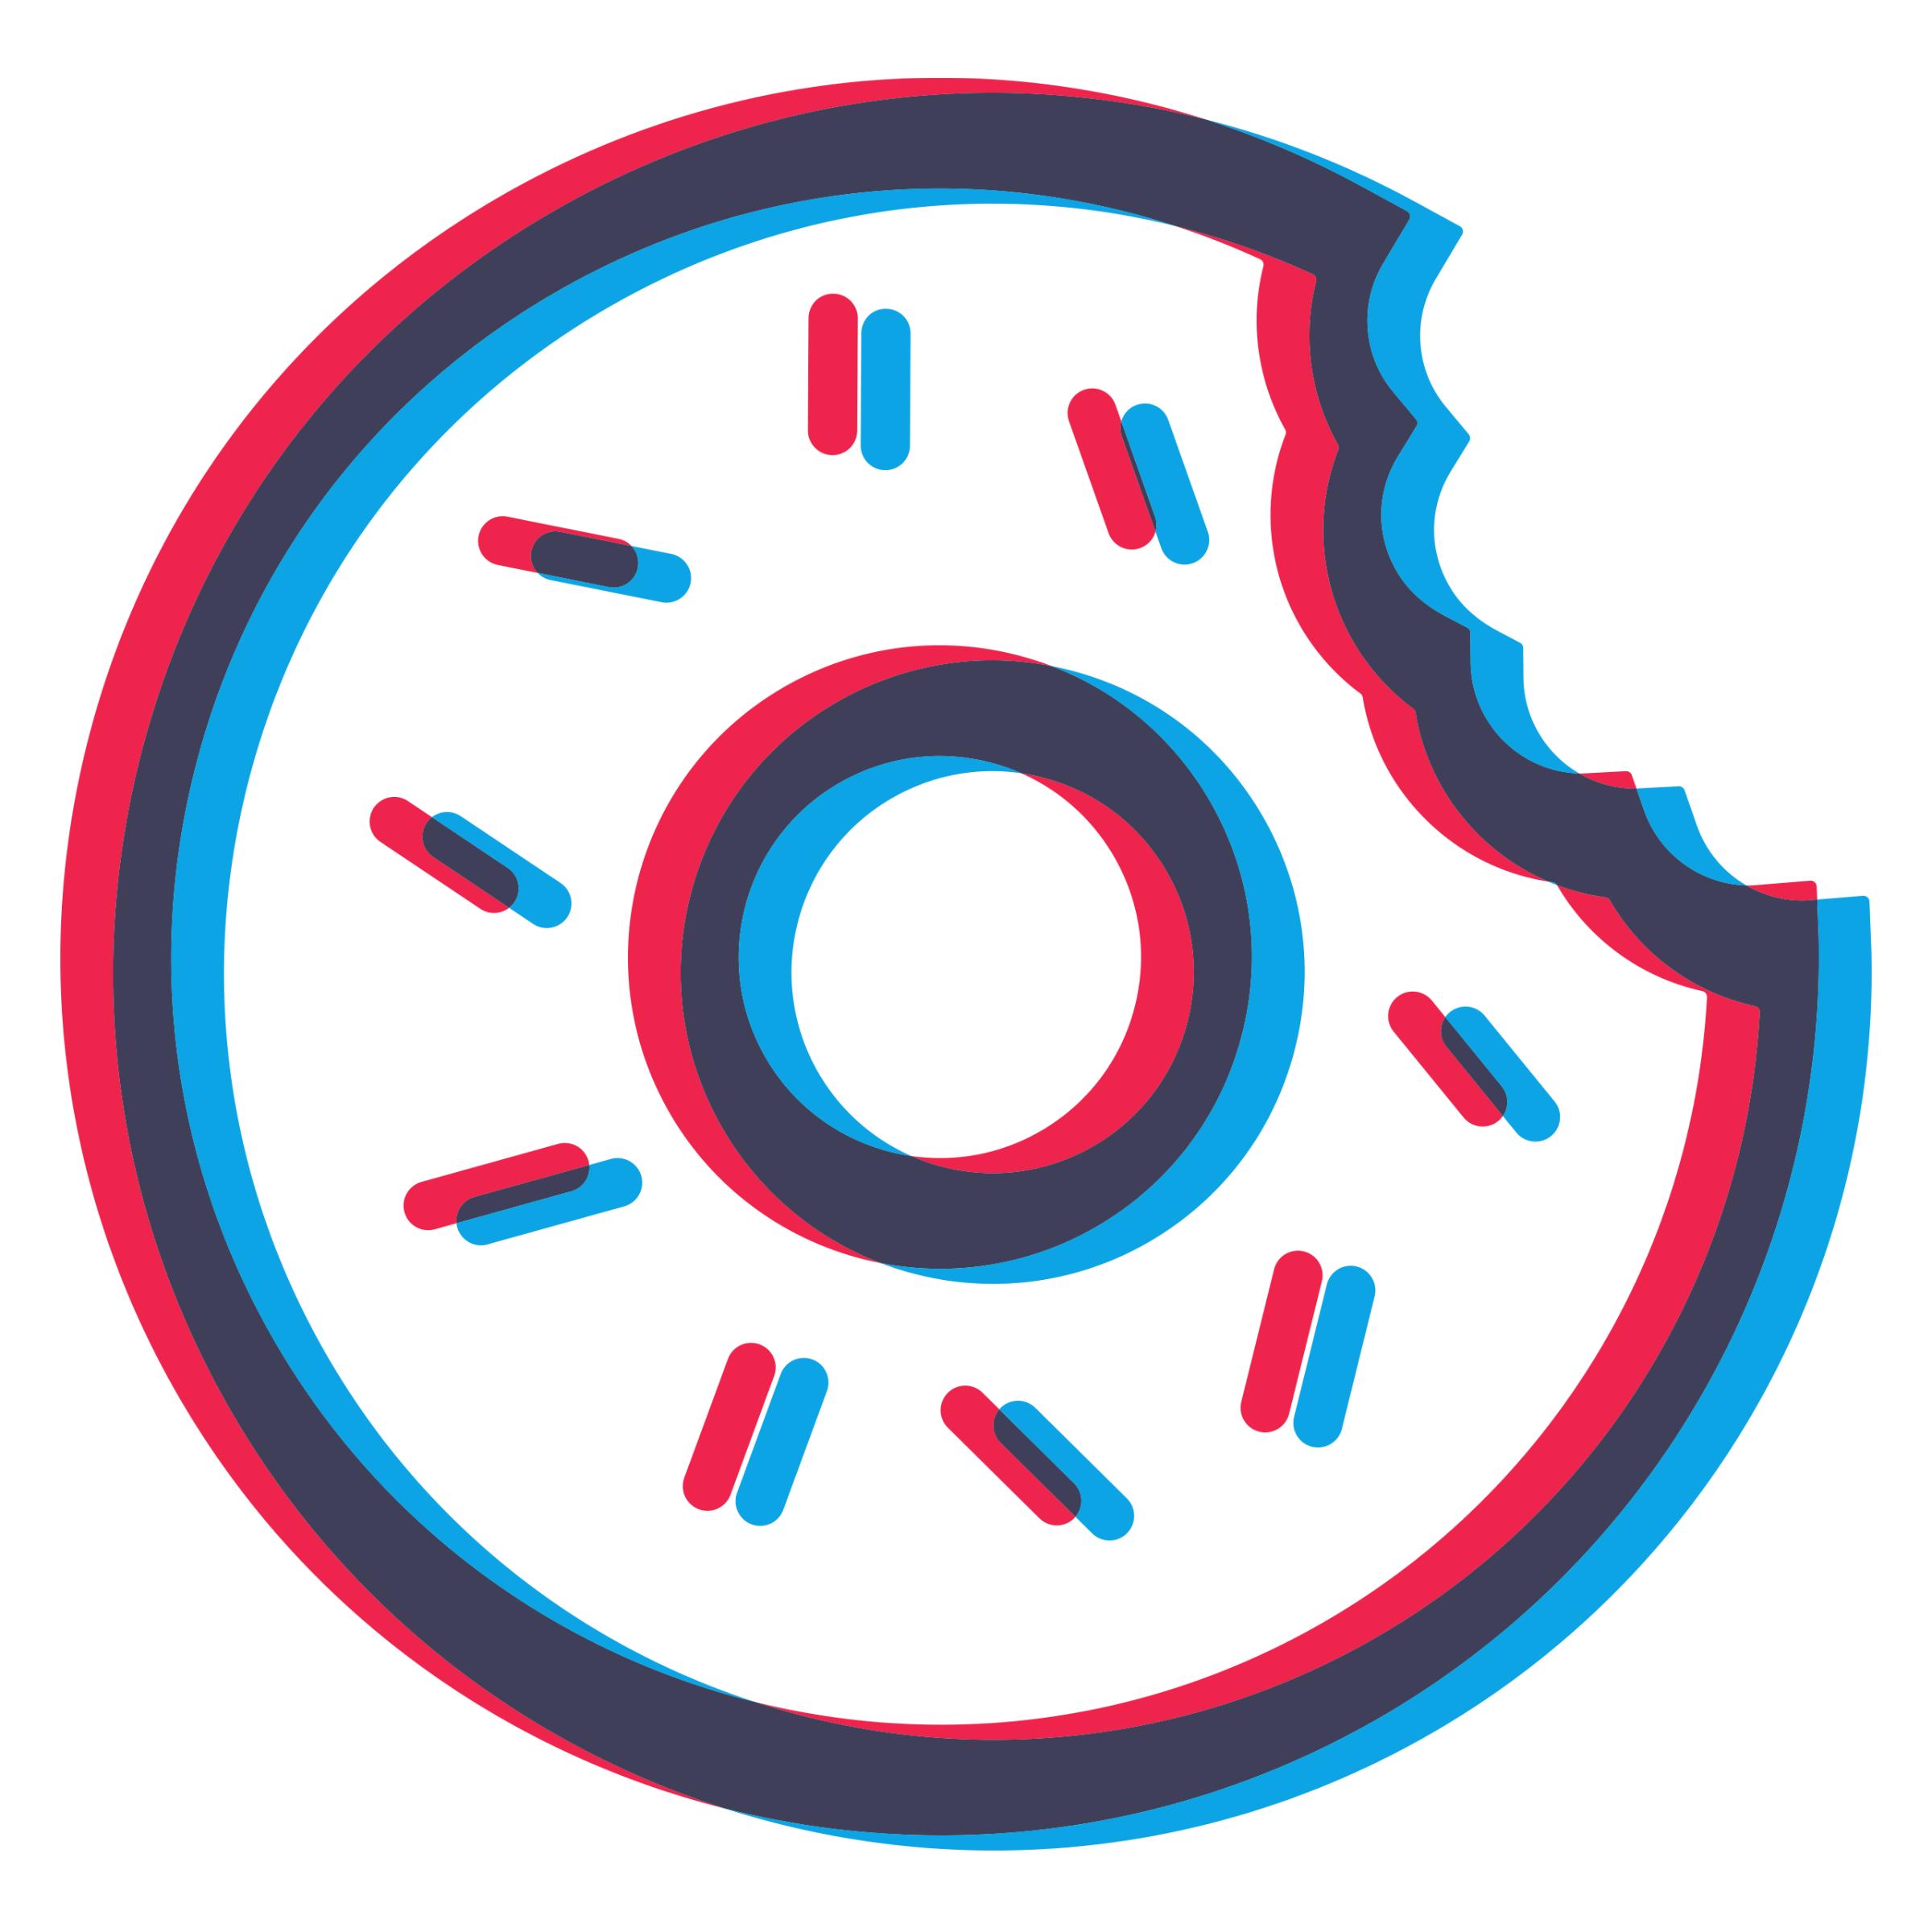 3-Donut Detail